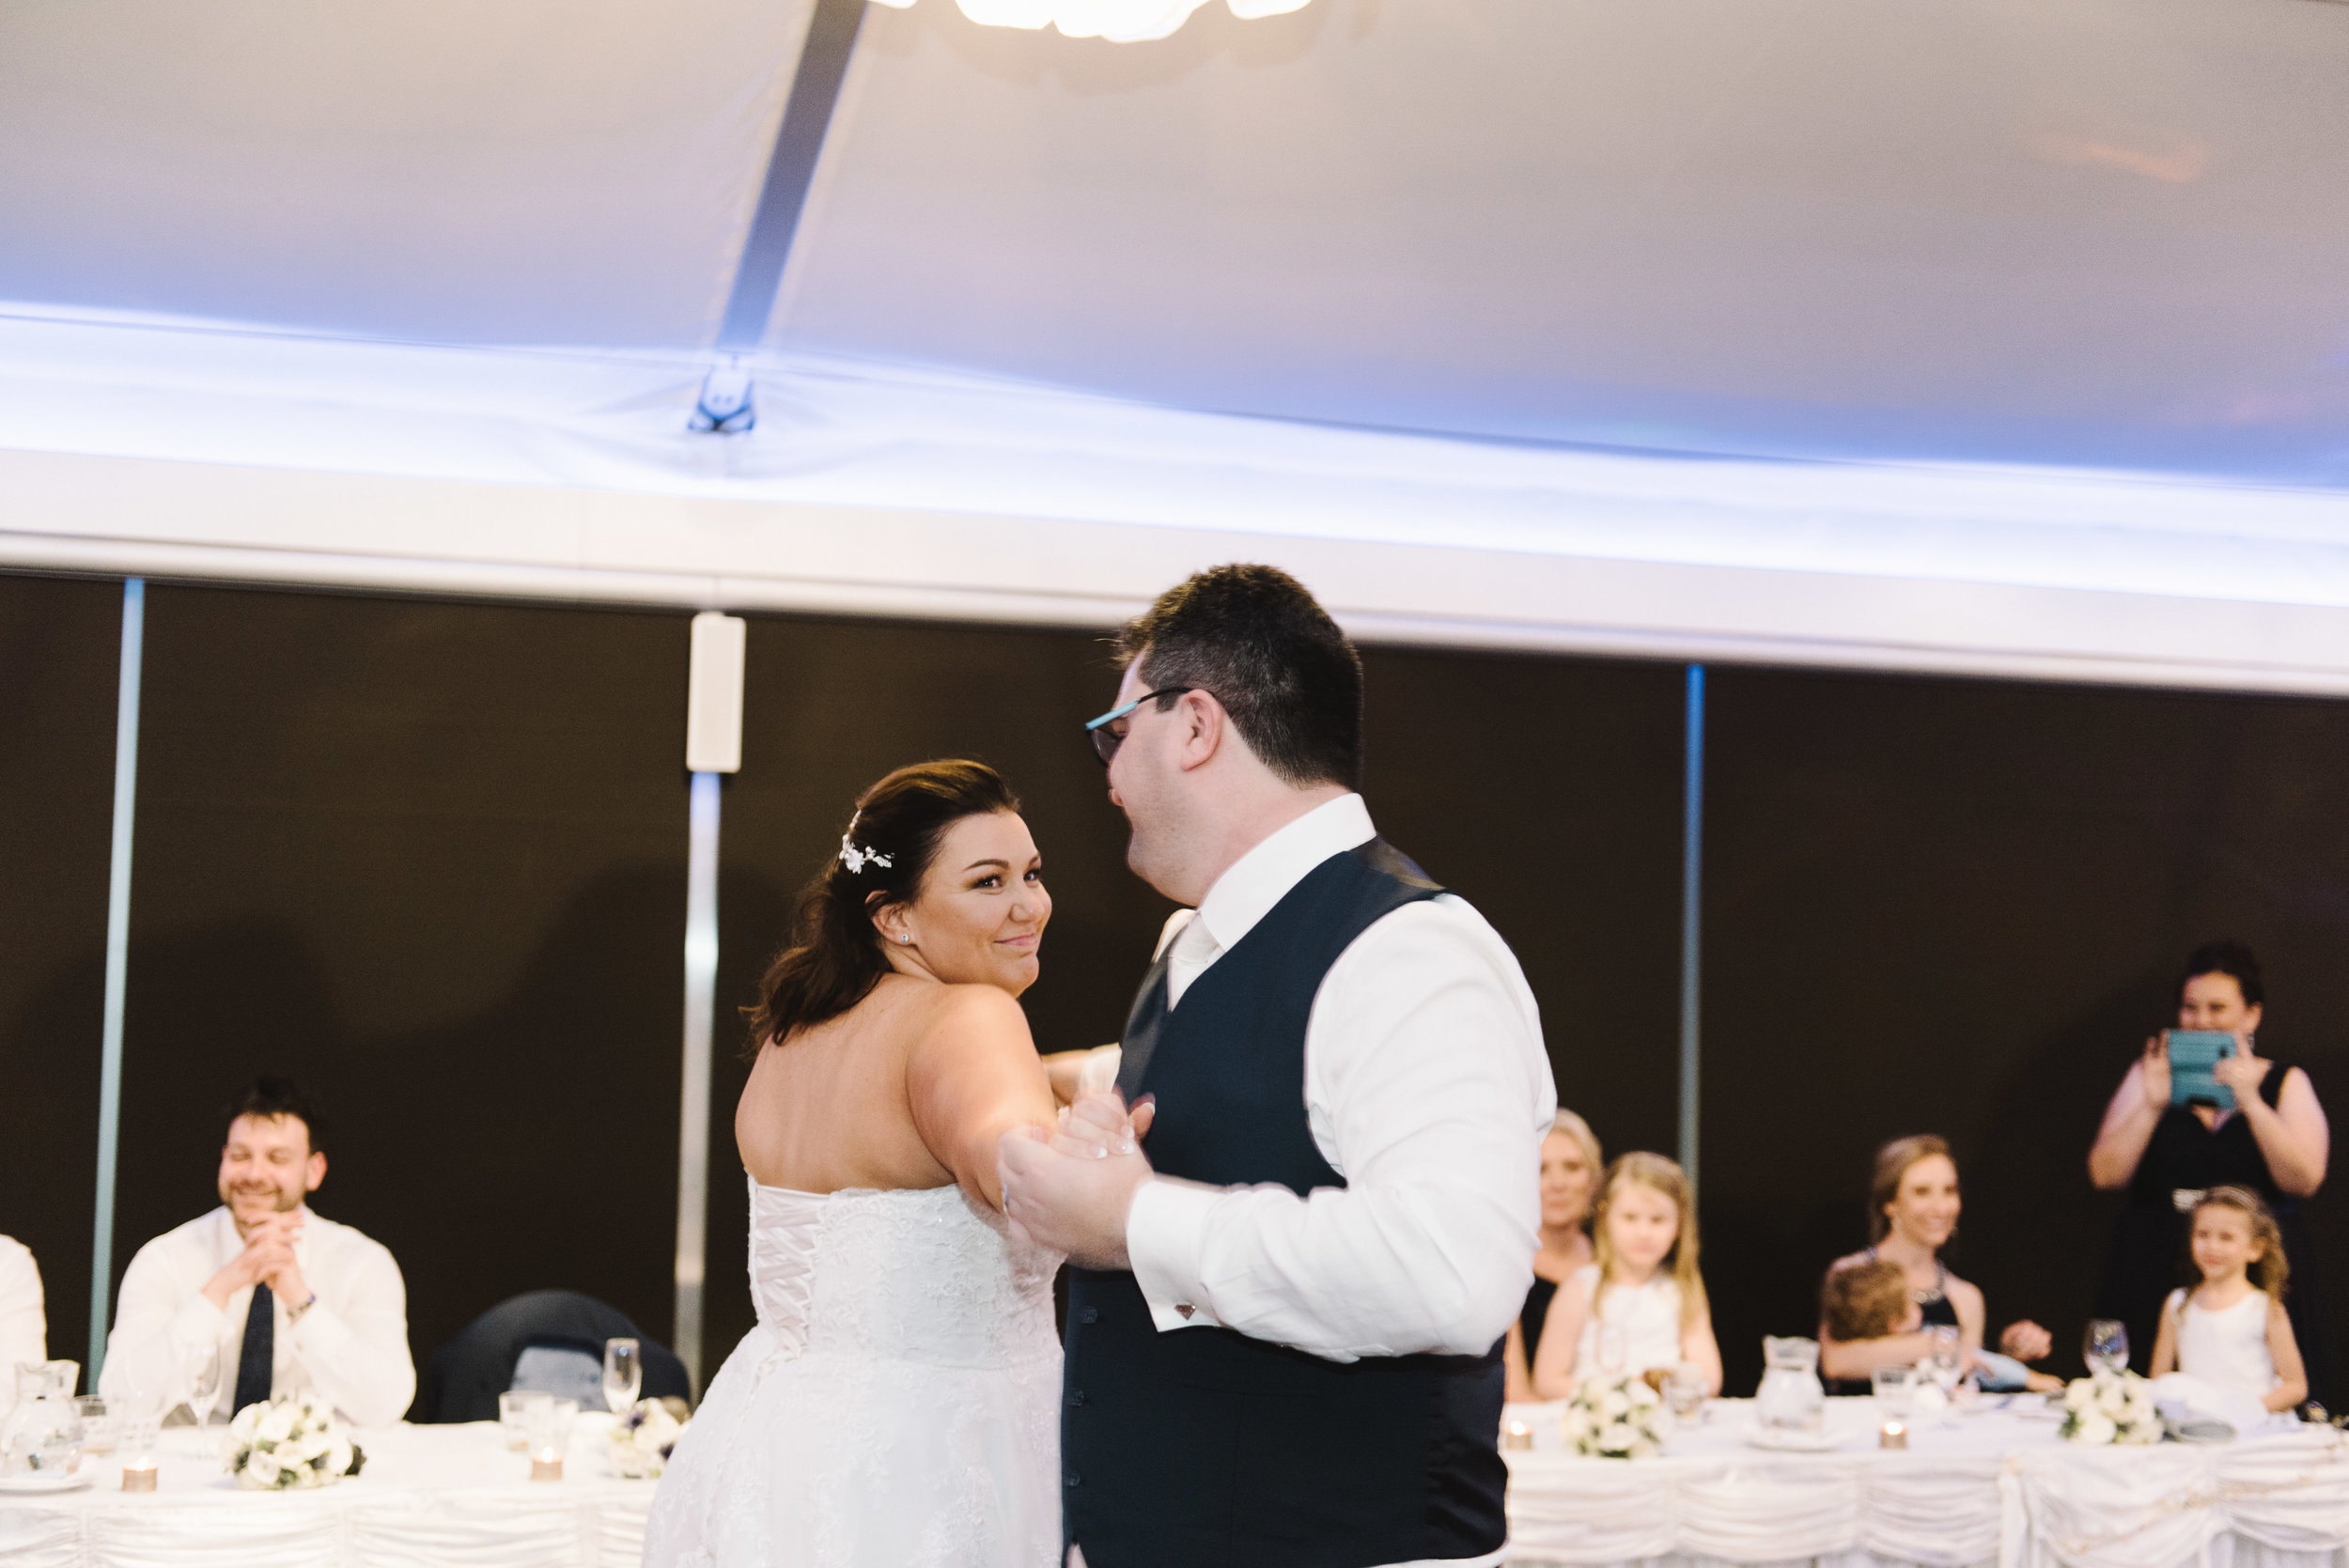 brisbane-wedding-photographer-119.jpg